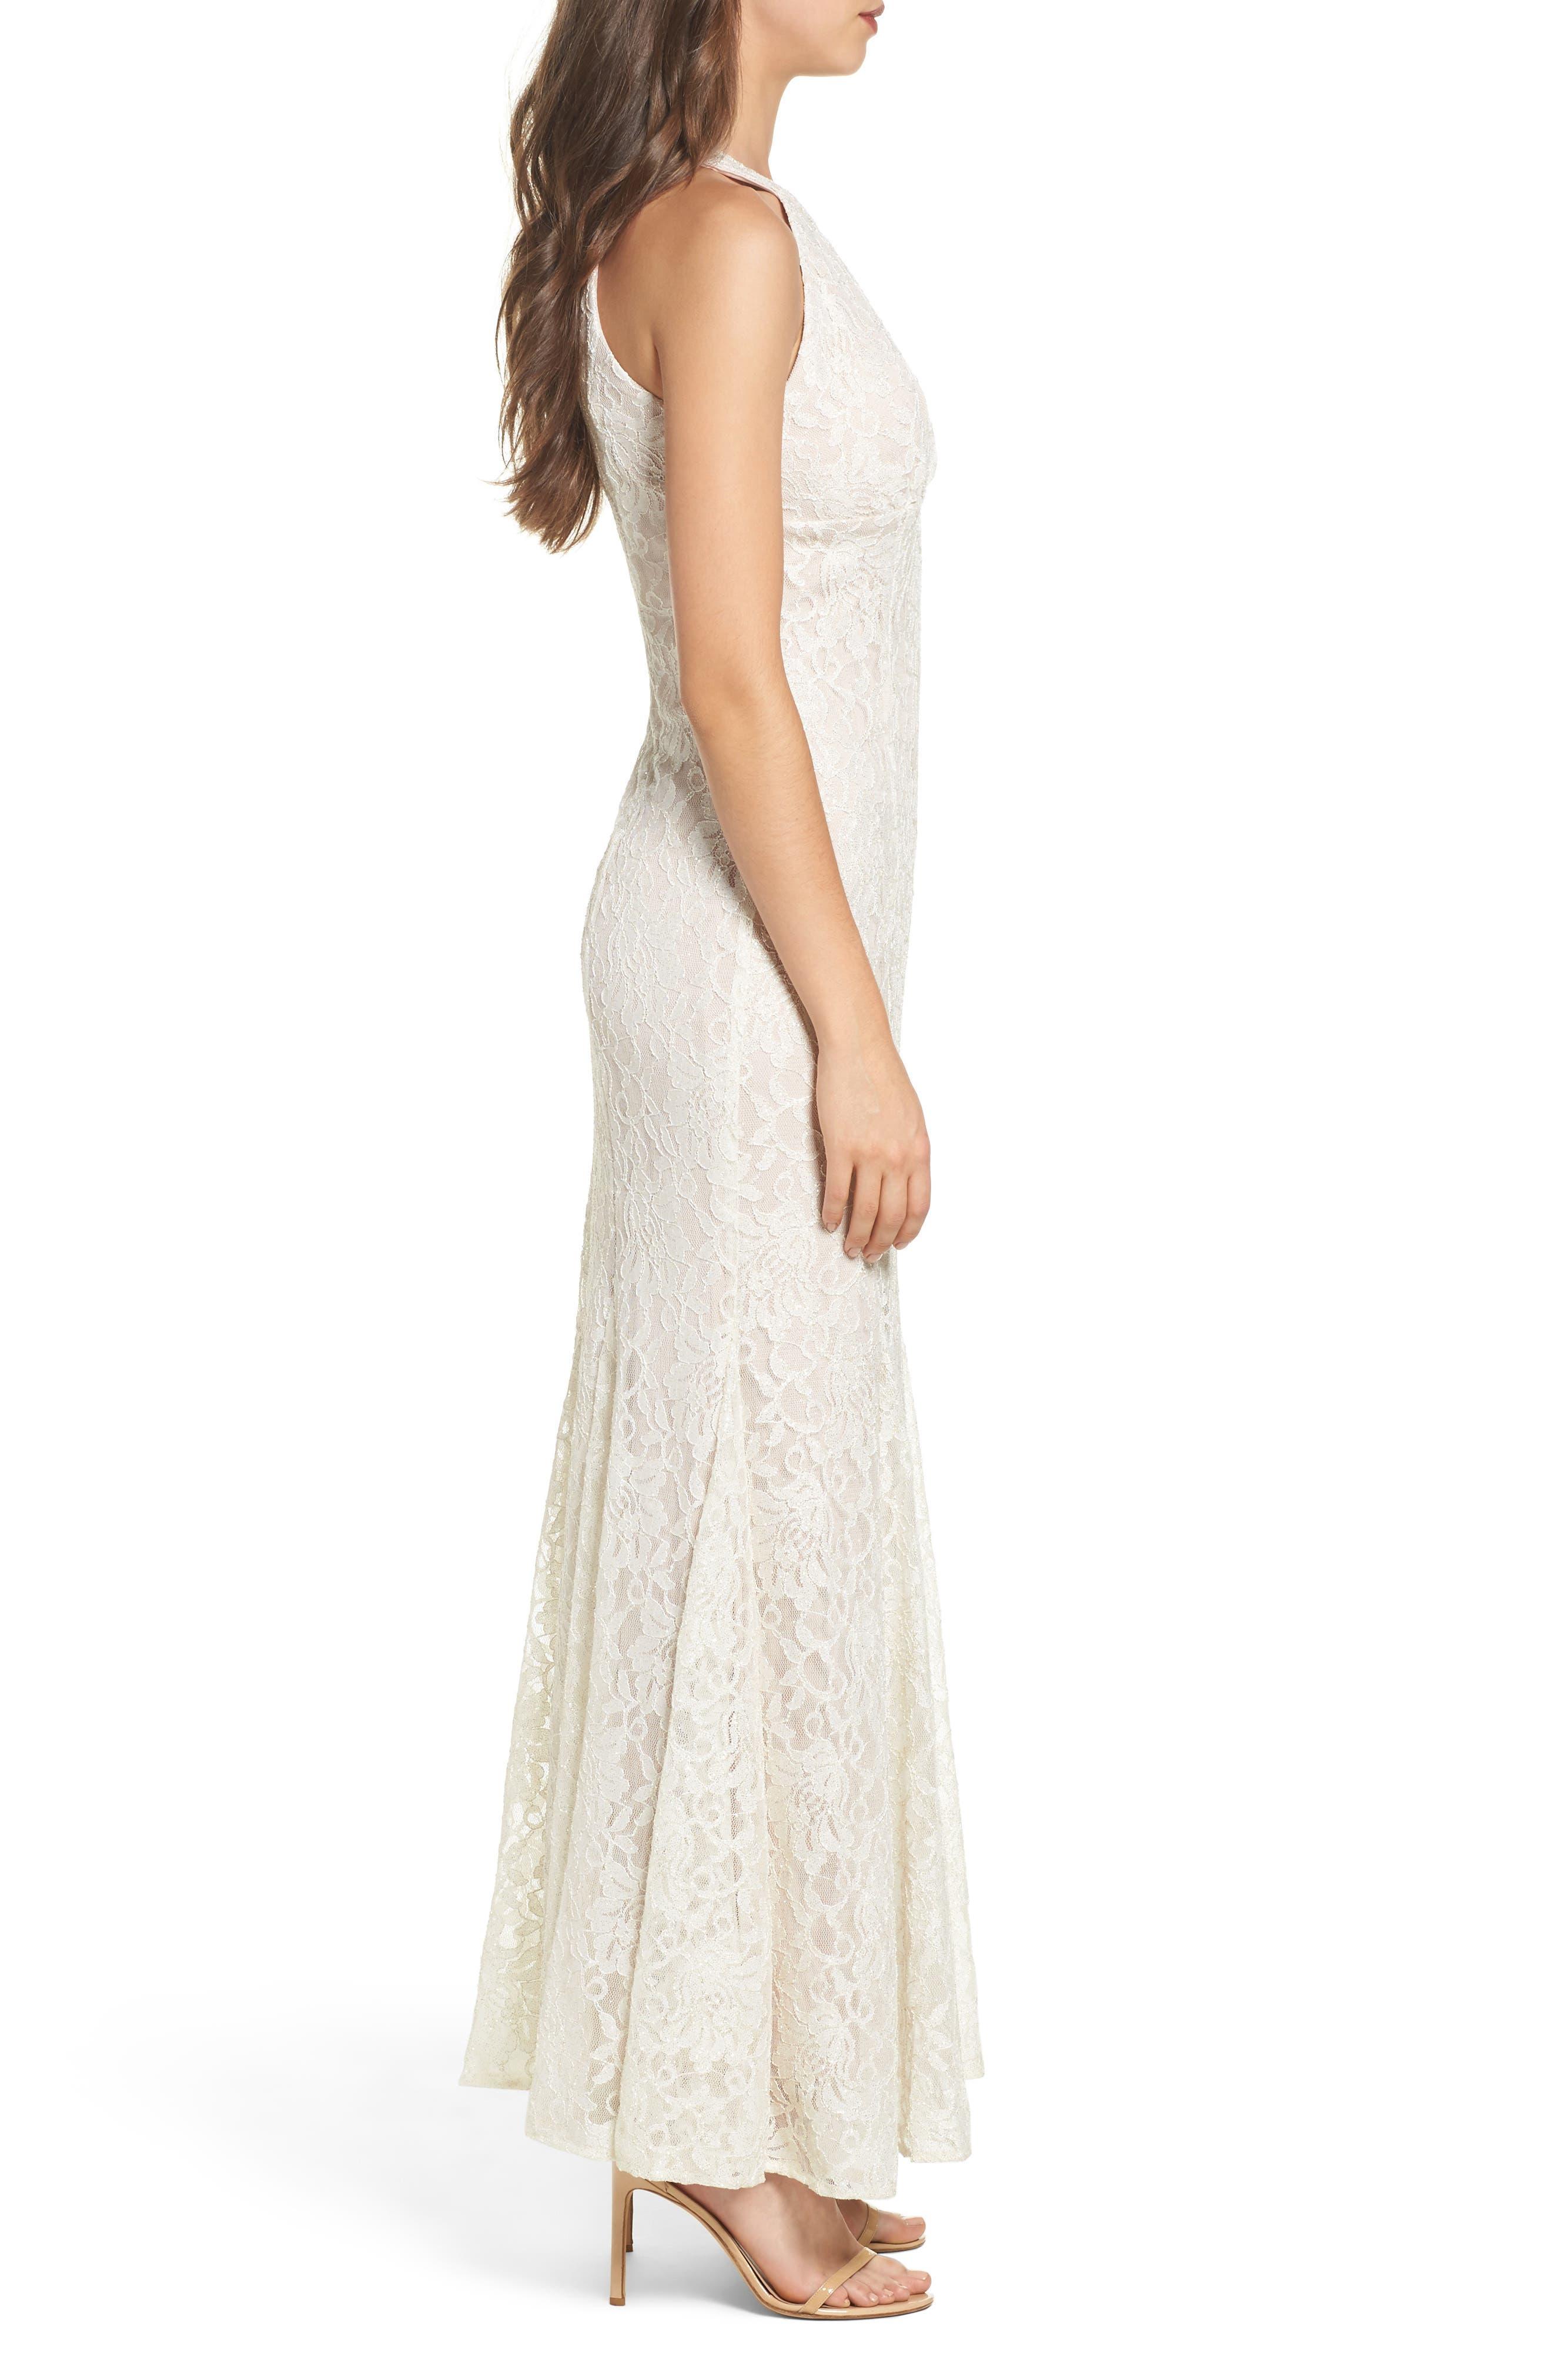 Scallop Detail Lace Gown,                             Alternate thumbnail 3, color,                             902